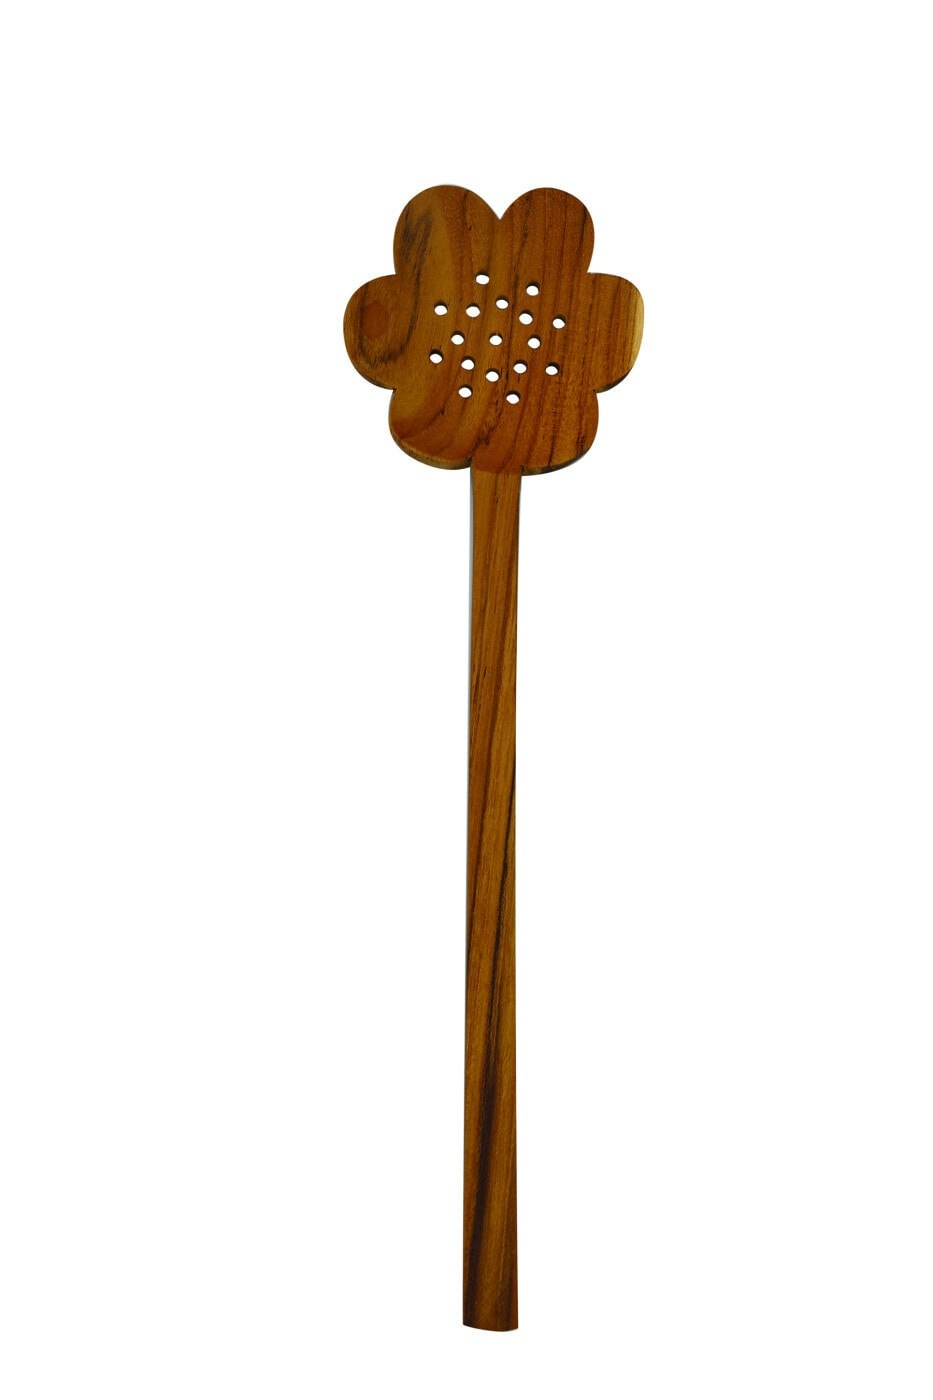 Teak Flower Strainer Spoon-1